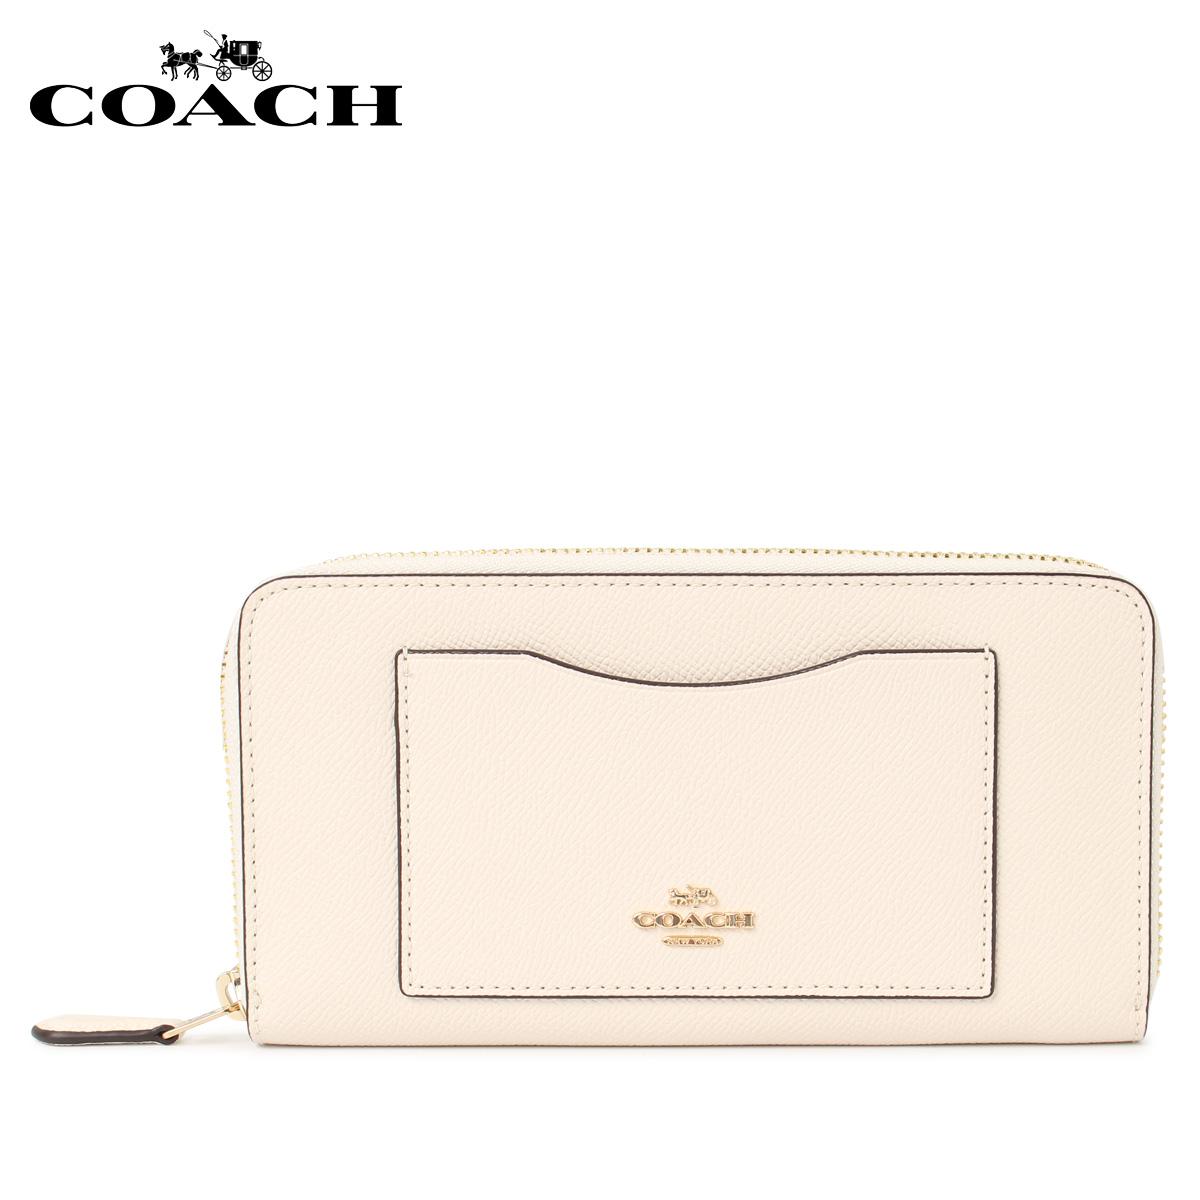 COACH F54007-IMCHK コーチ 財布 長財布 レディース ラウンドファスナー オフ ホワイト